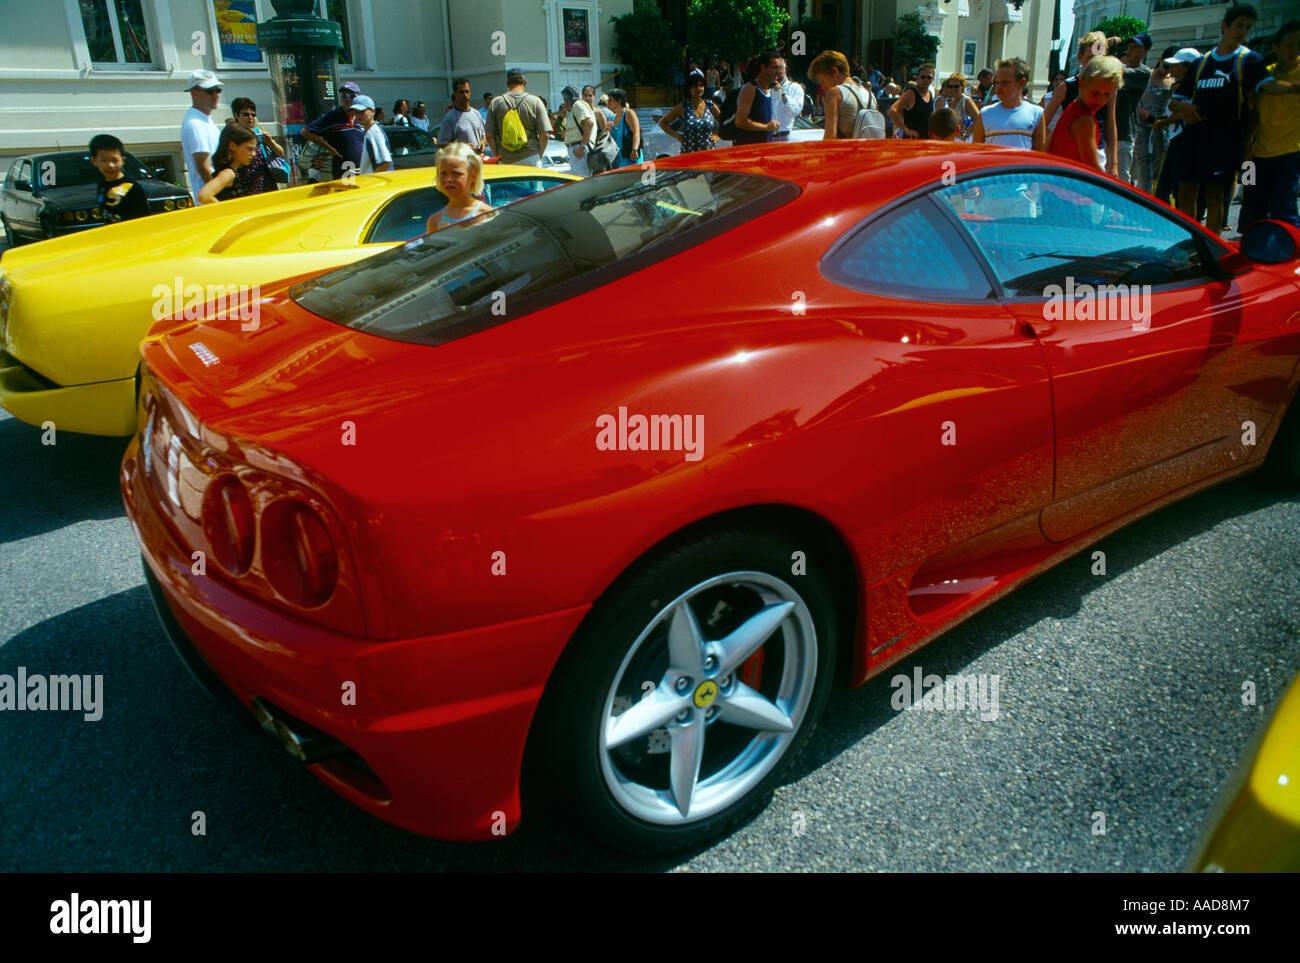 rent in gtb balco pin casino today cars ferrari monaco